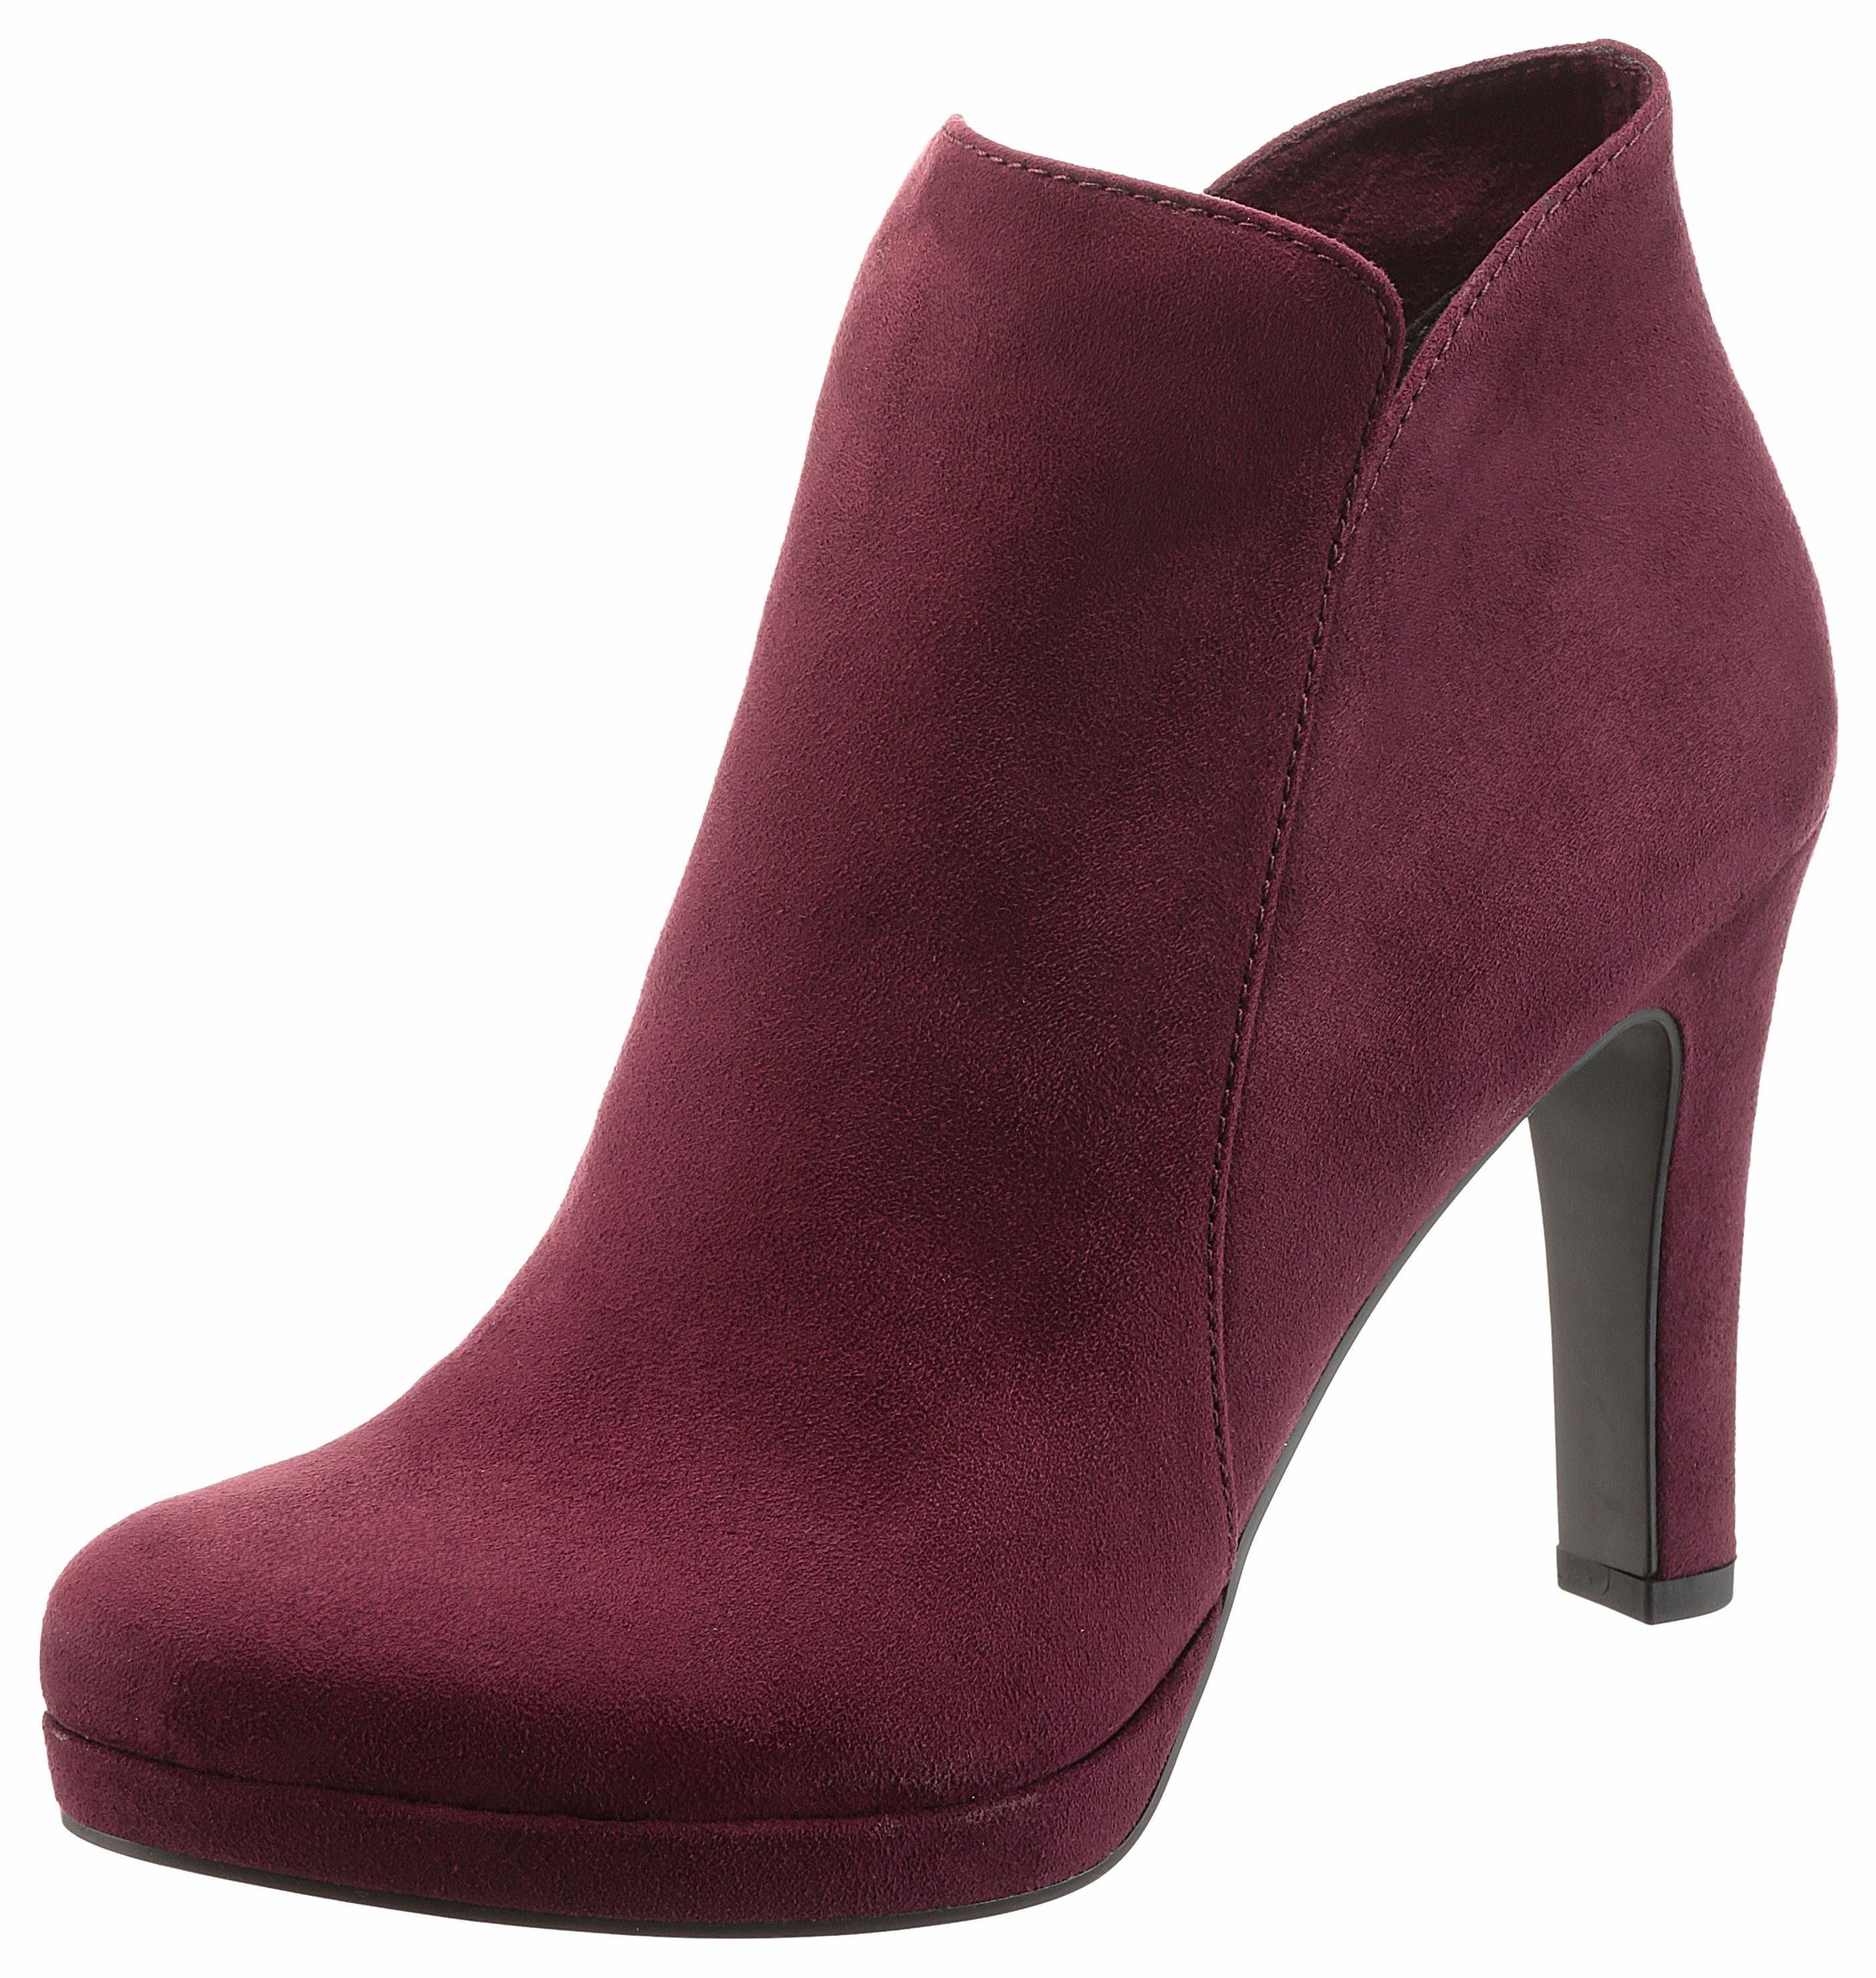 Tamaris High-Heel-Stiefelette, im femininen Look, rosa, EURO-Größen, rosa